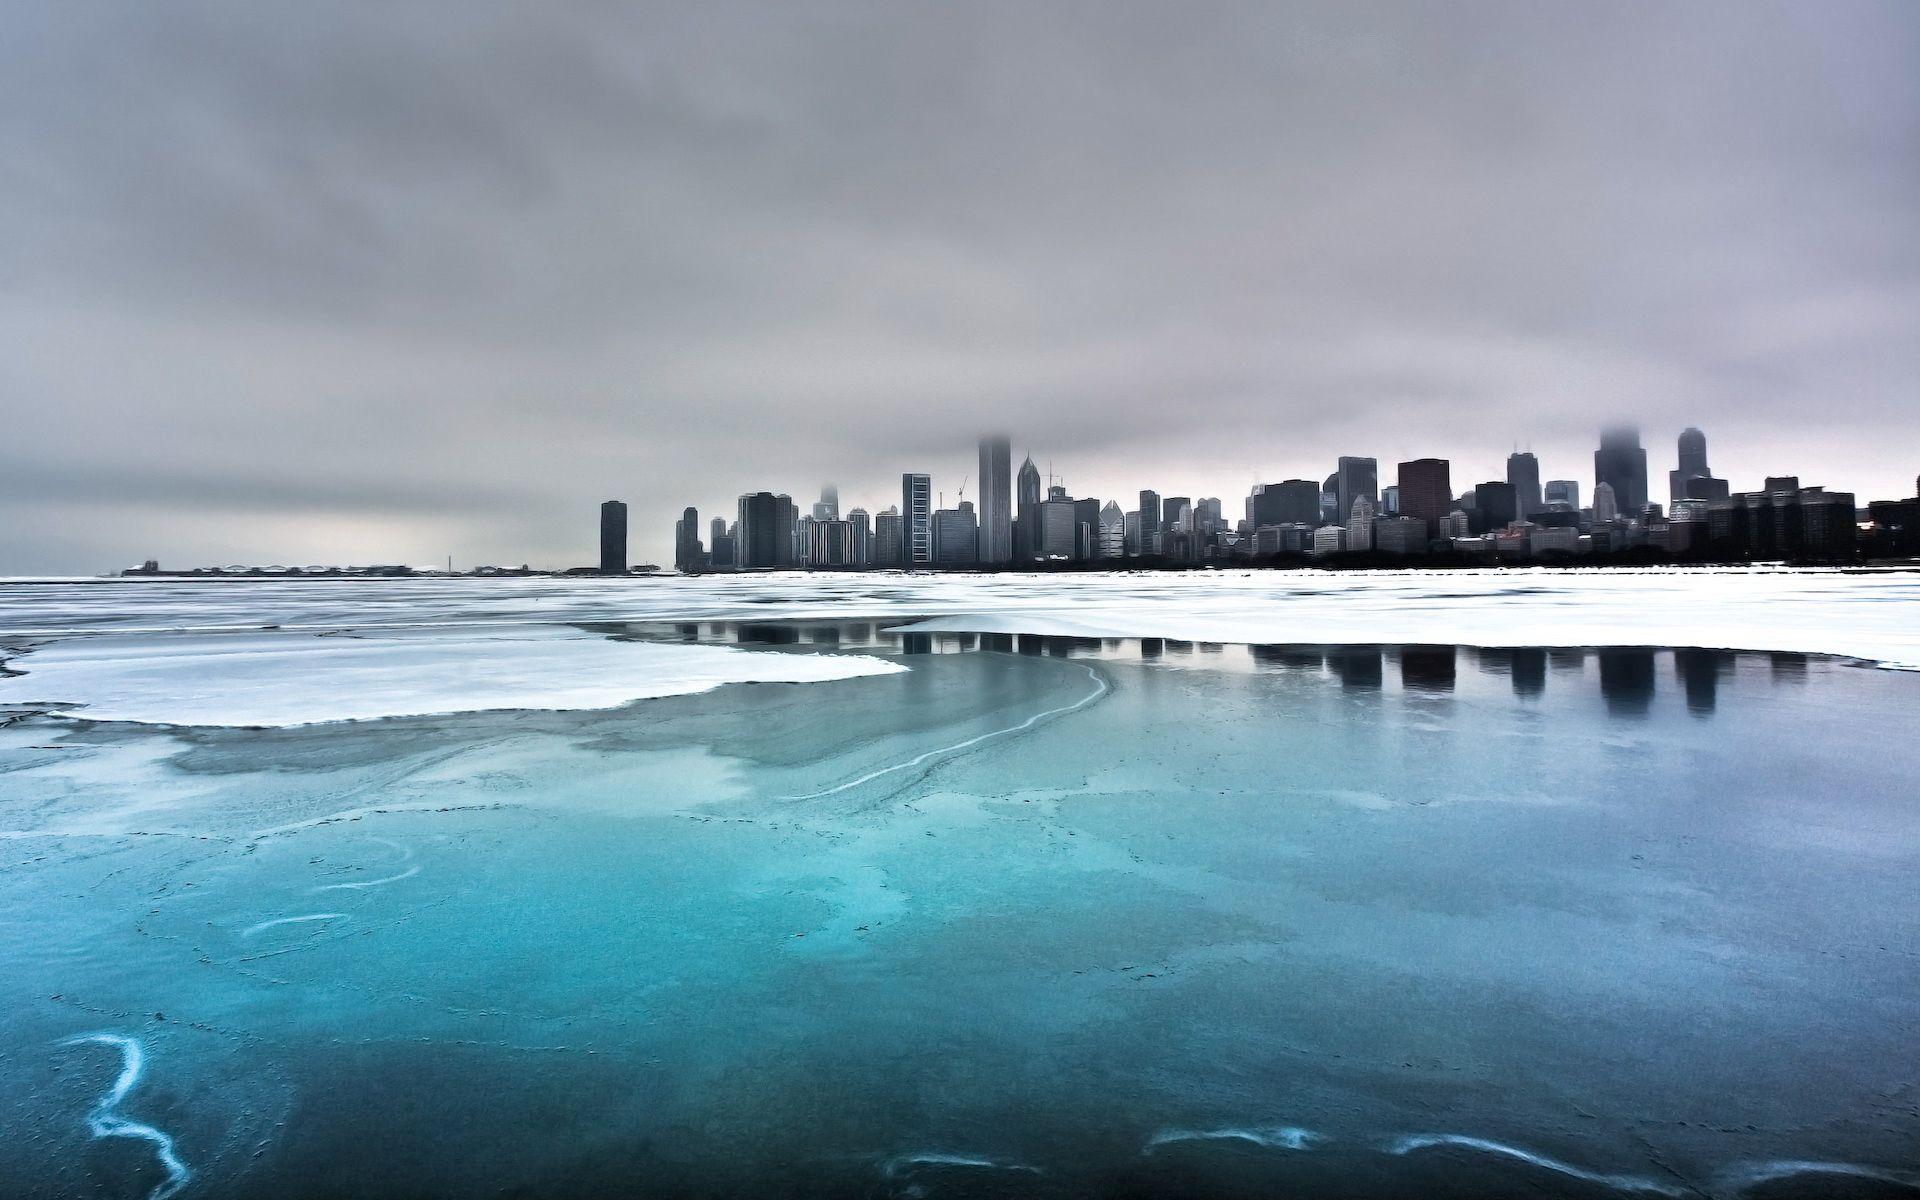 146402 скачать обои Природа, Город, Зима, Океан, Побережье, Лед, Туман, Холод - заставки и картинки бесплатно